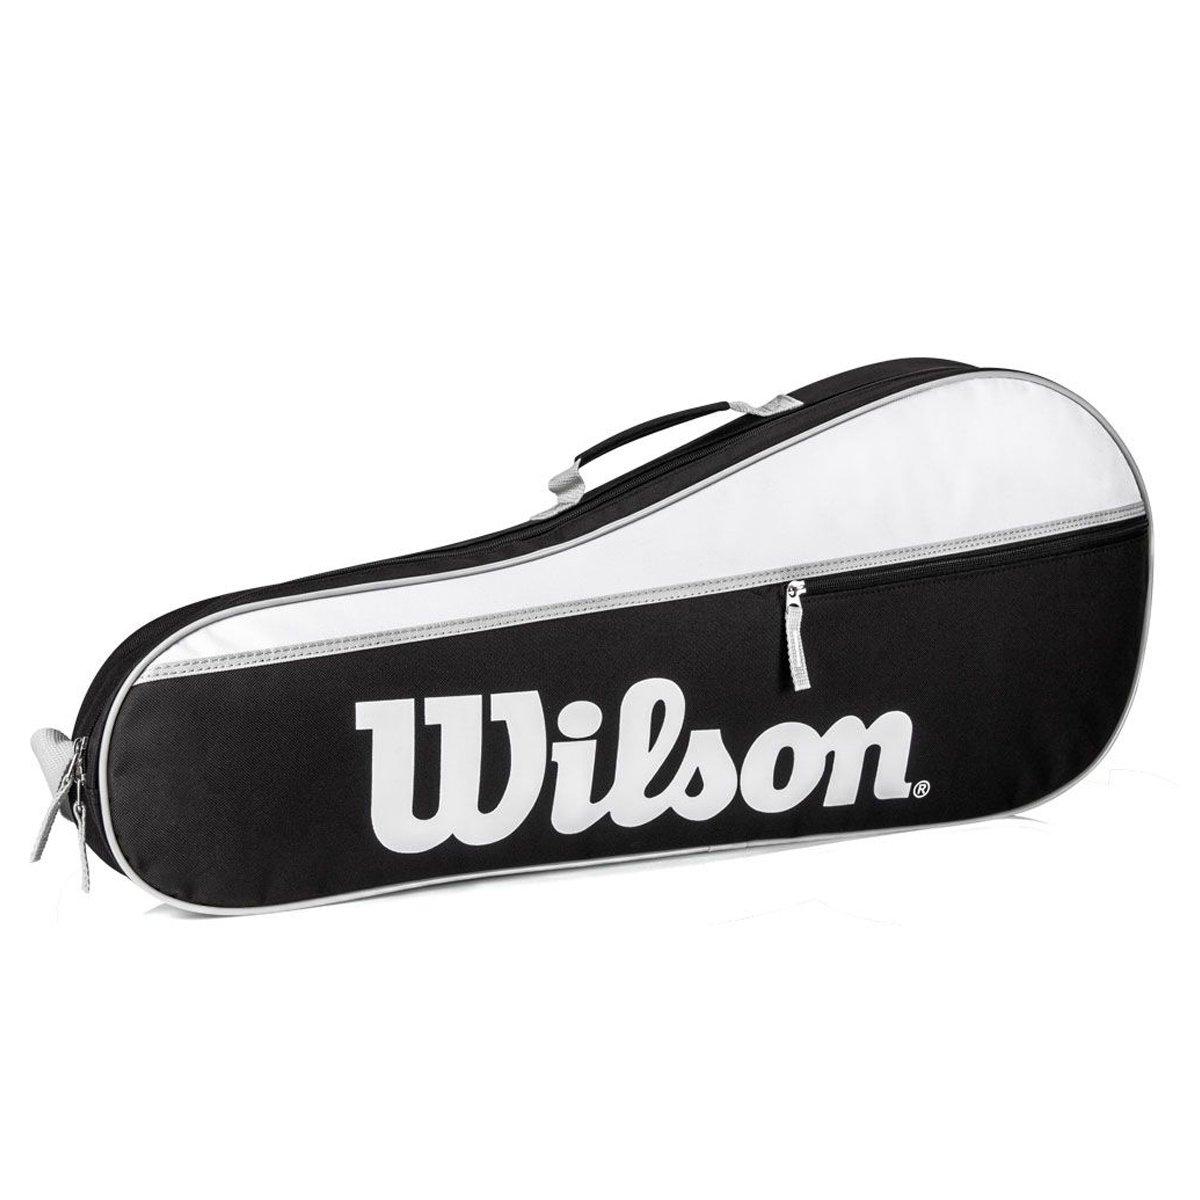 Raqueteira Wilson Advantage Pro Triple 3R Preta Branca e Cz